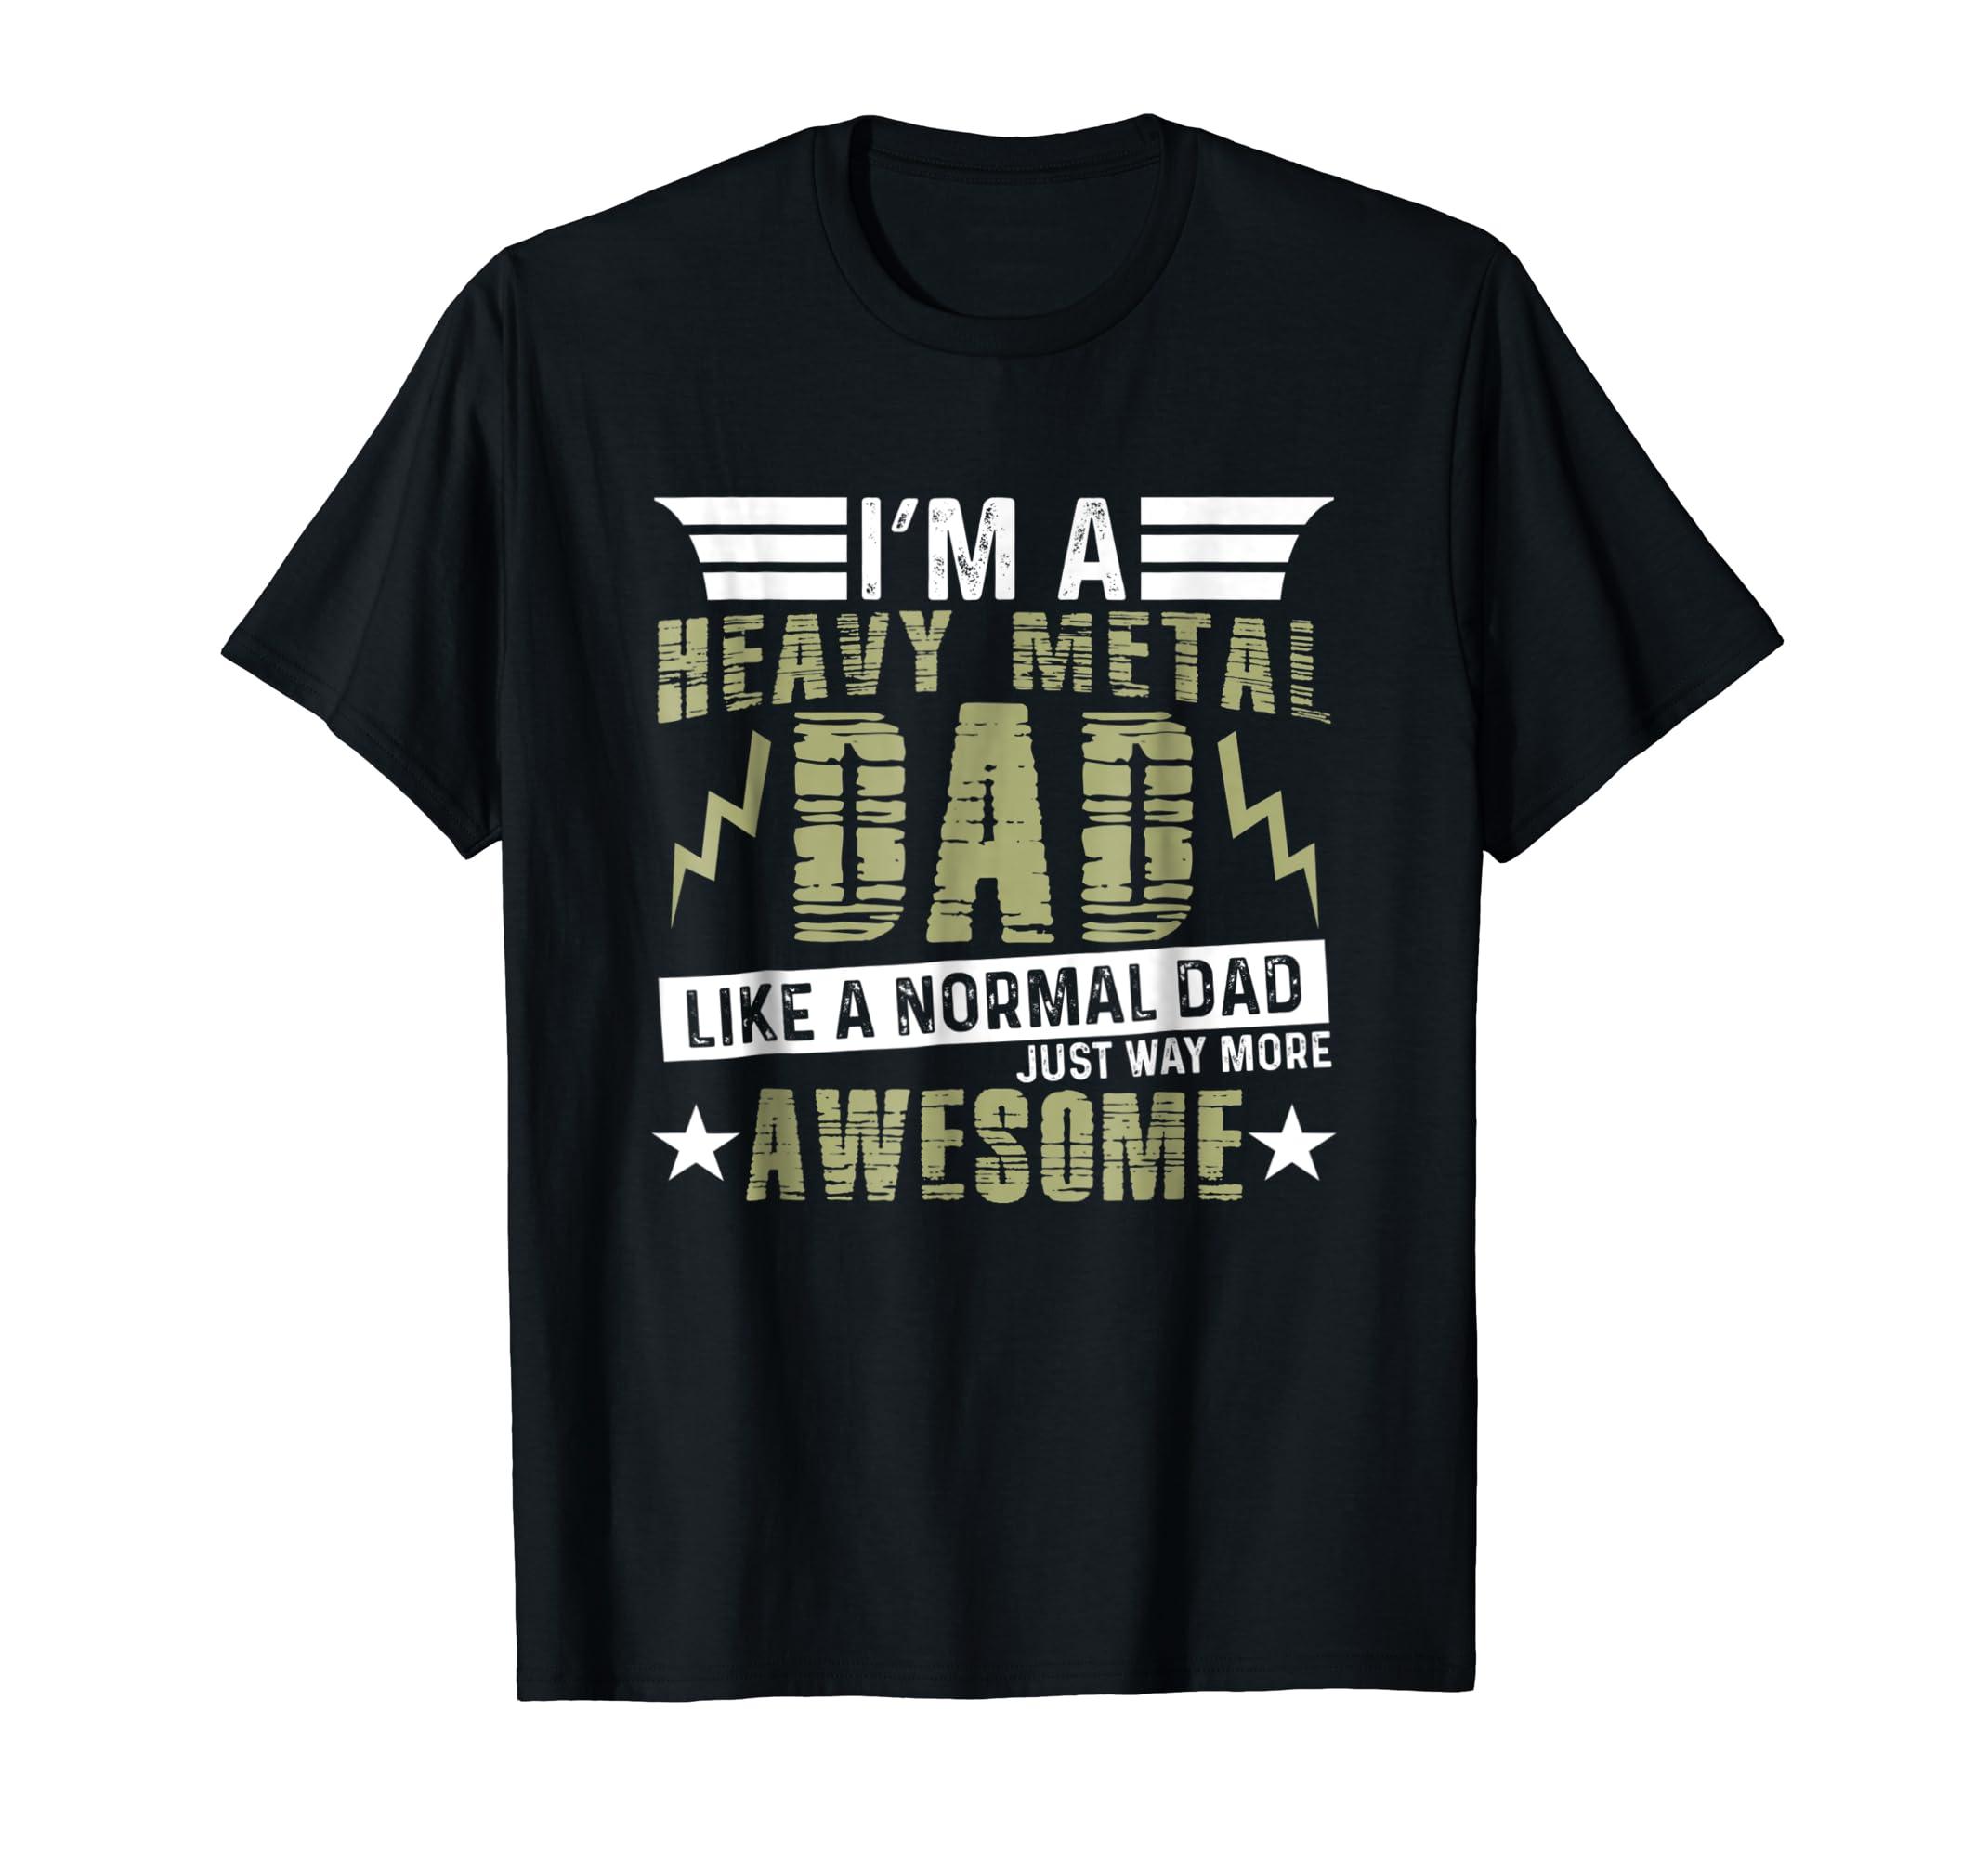 bc474546 Heavy Metal Dad Best Dad Ever Shirt Daddy Metal Father Gift Hoodie  Sweatshirt - Depotees